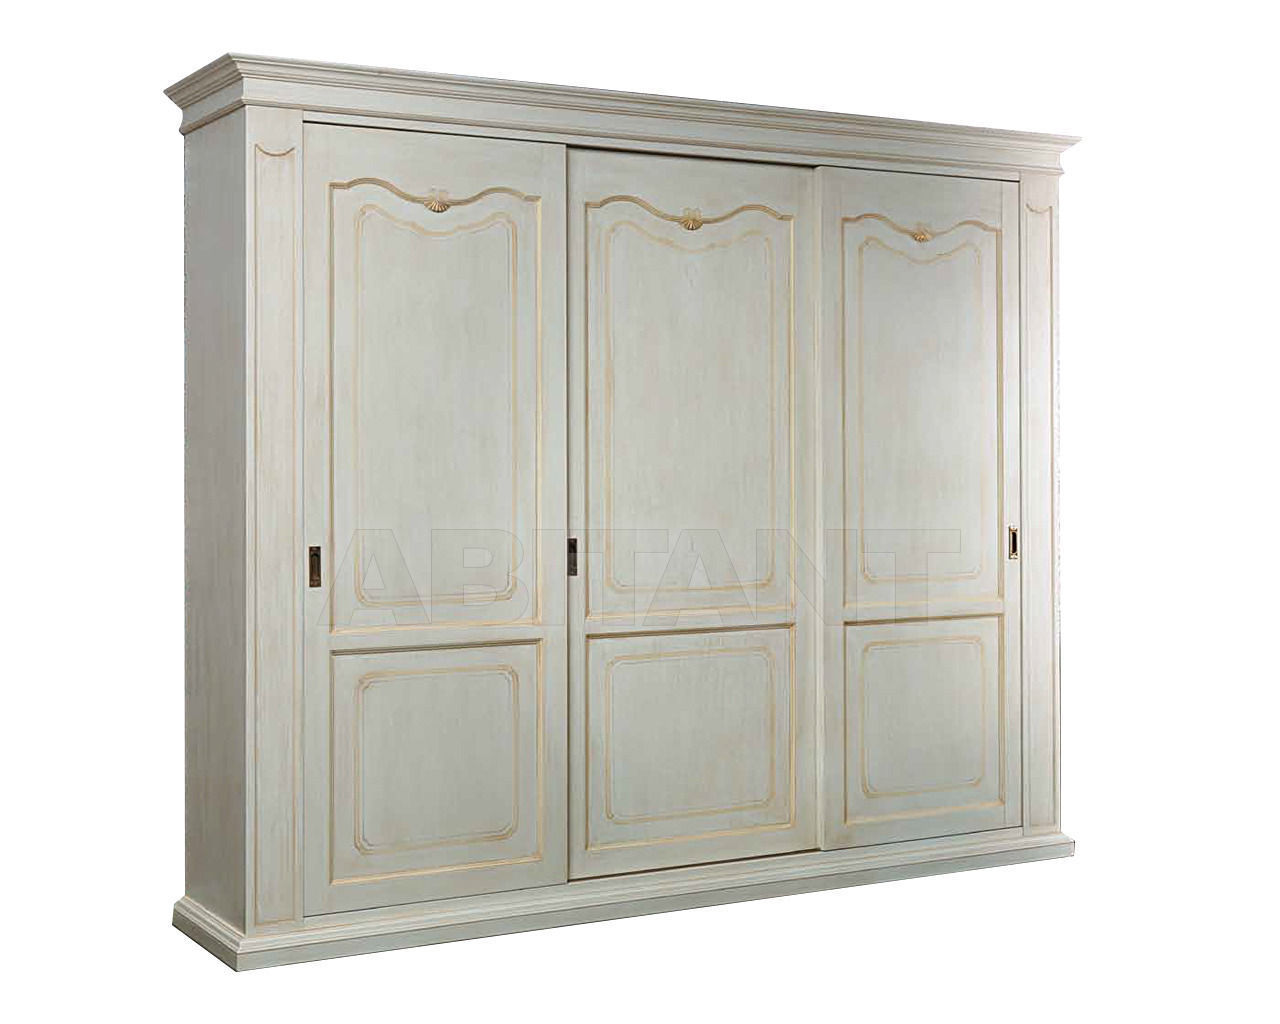 Купить Шкаф гардеробный Vimercati Armadi 2800